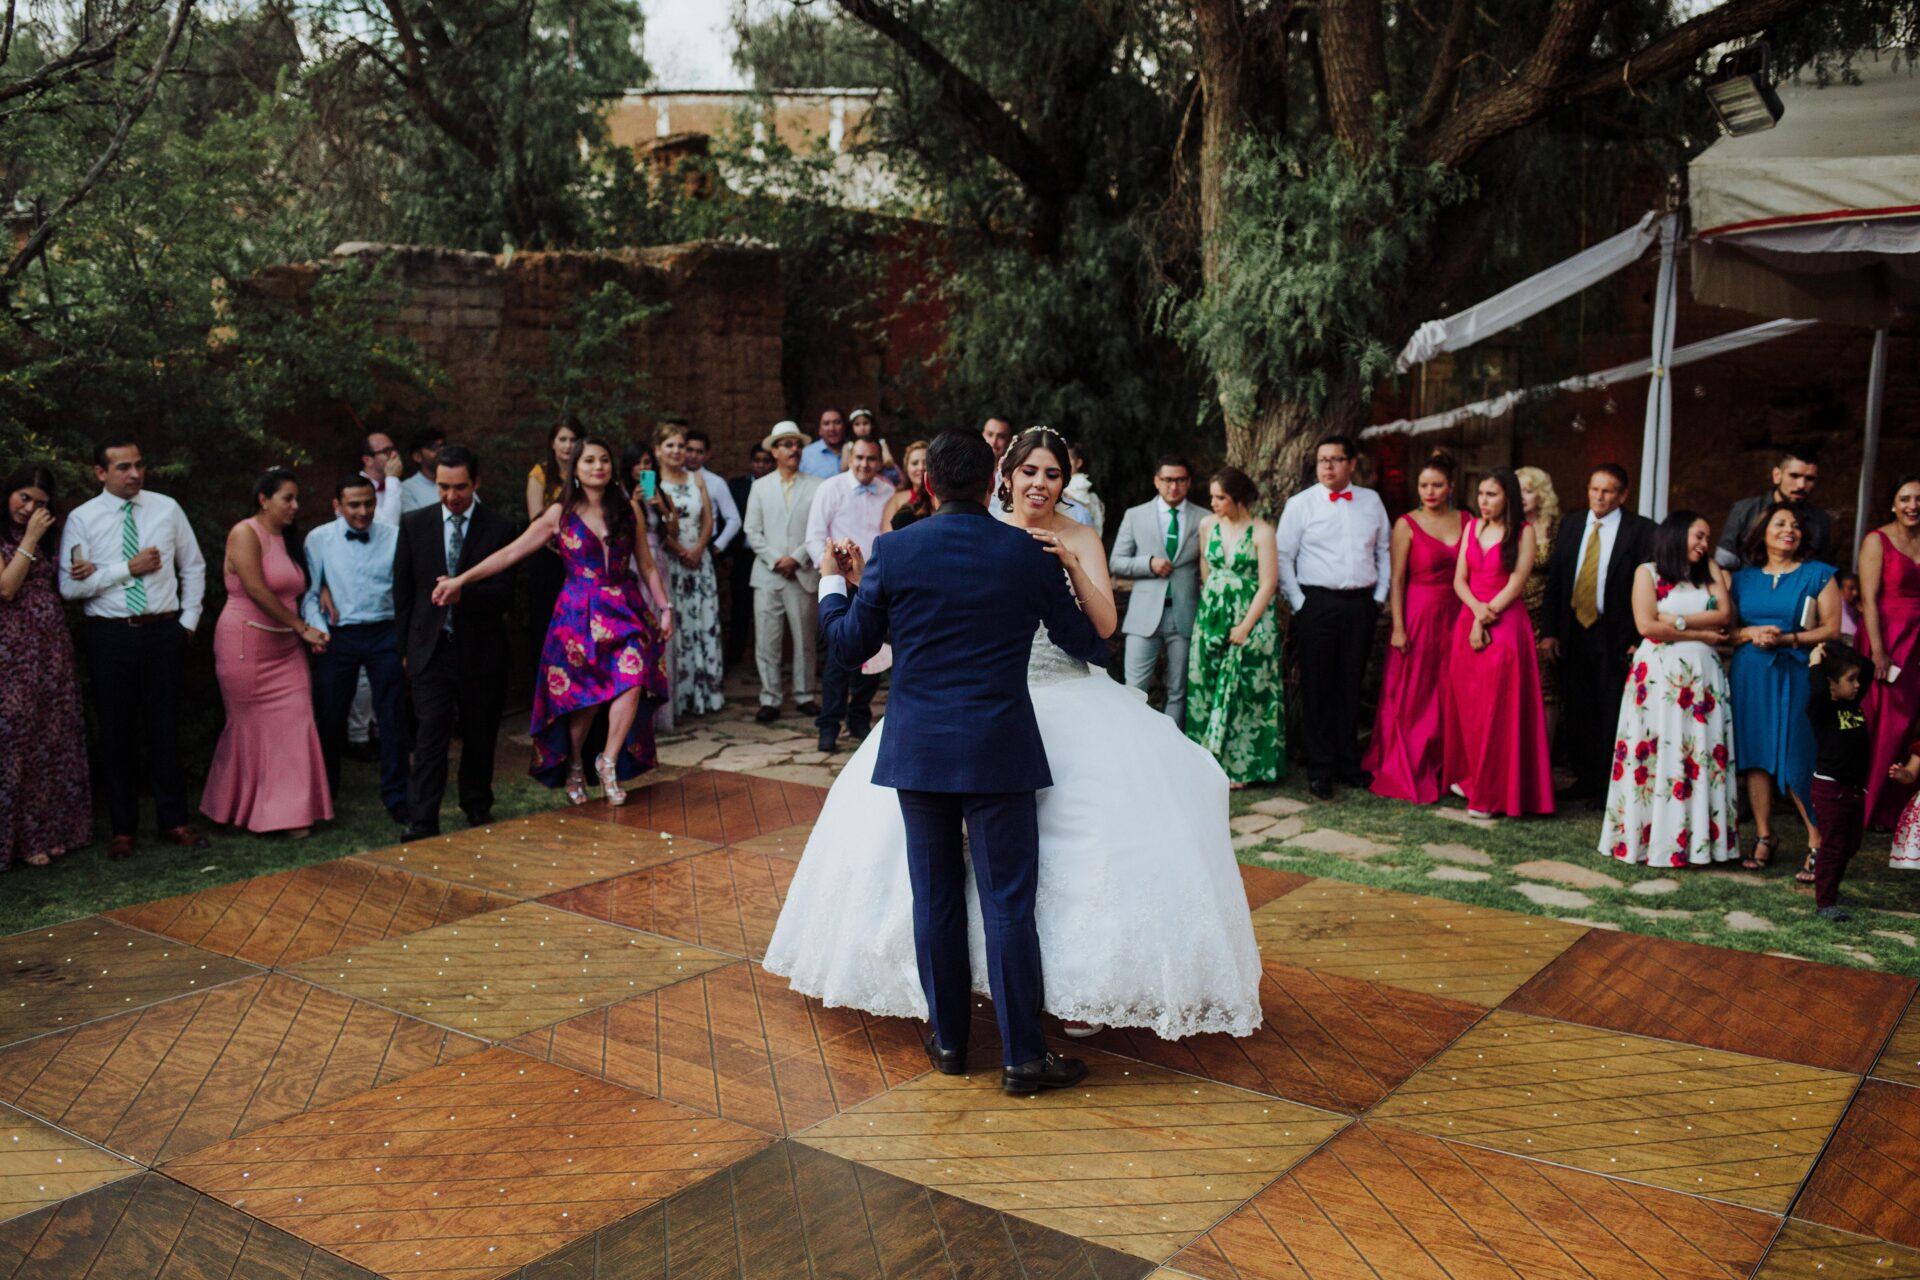 javier_noriega_fotografo_bodas_exhacienda_las_mercedes_zacatecas_wedding_photographer12a